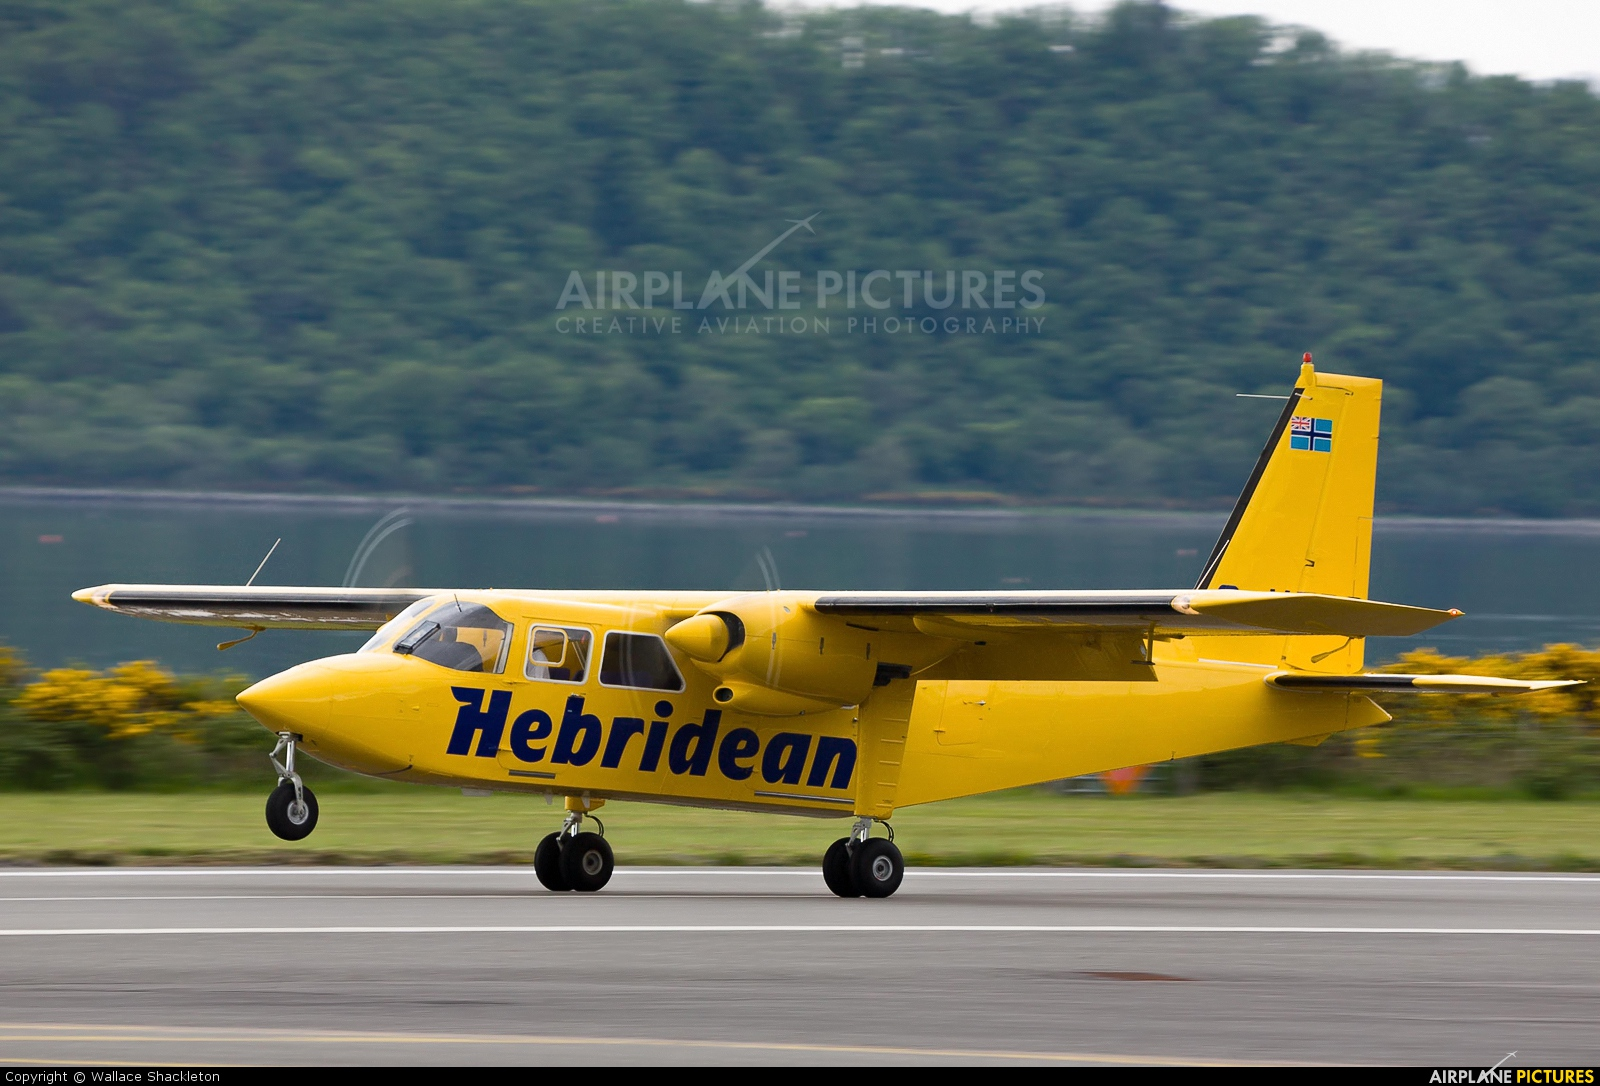 Hebridean Air Services G-HEBO aircraft at Oban